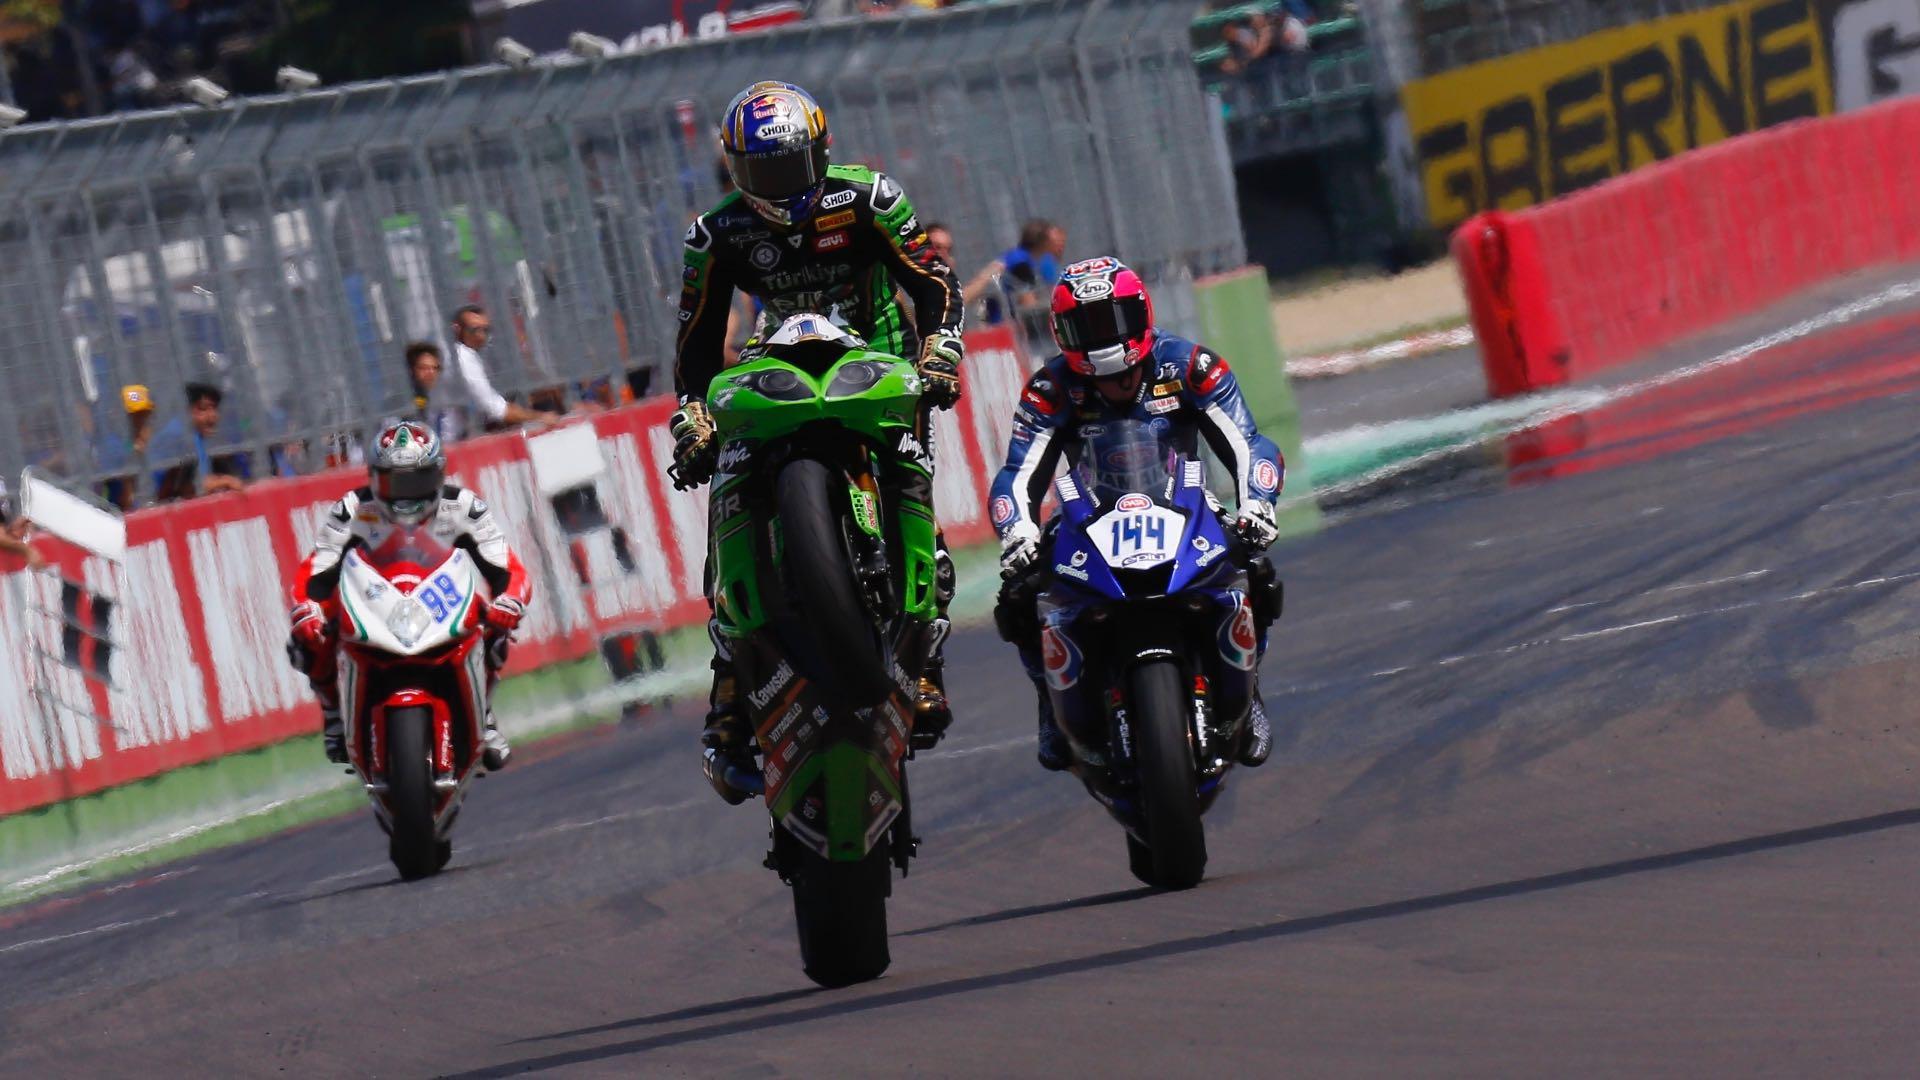 2017 Imola World Supersport: Kawasaki's Sofuoglu wins